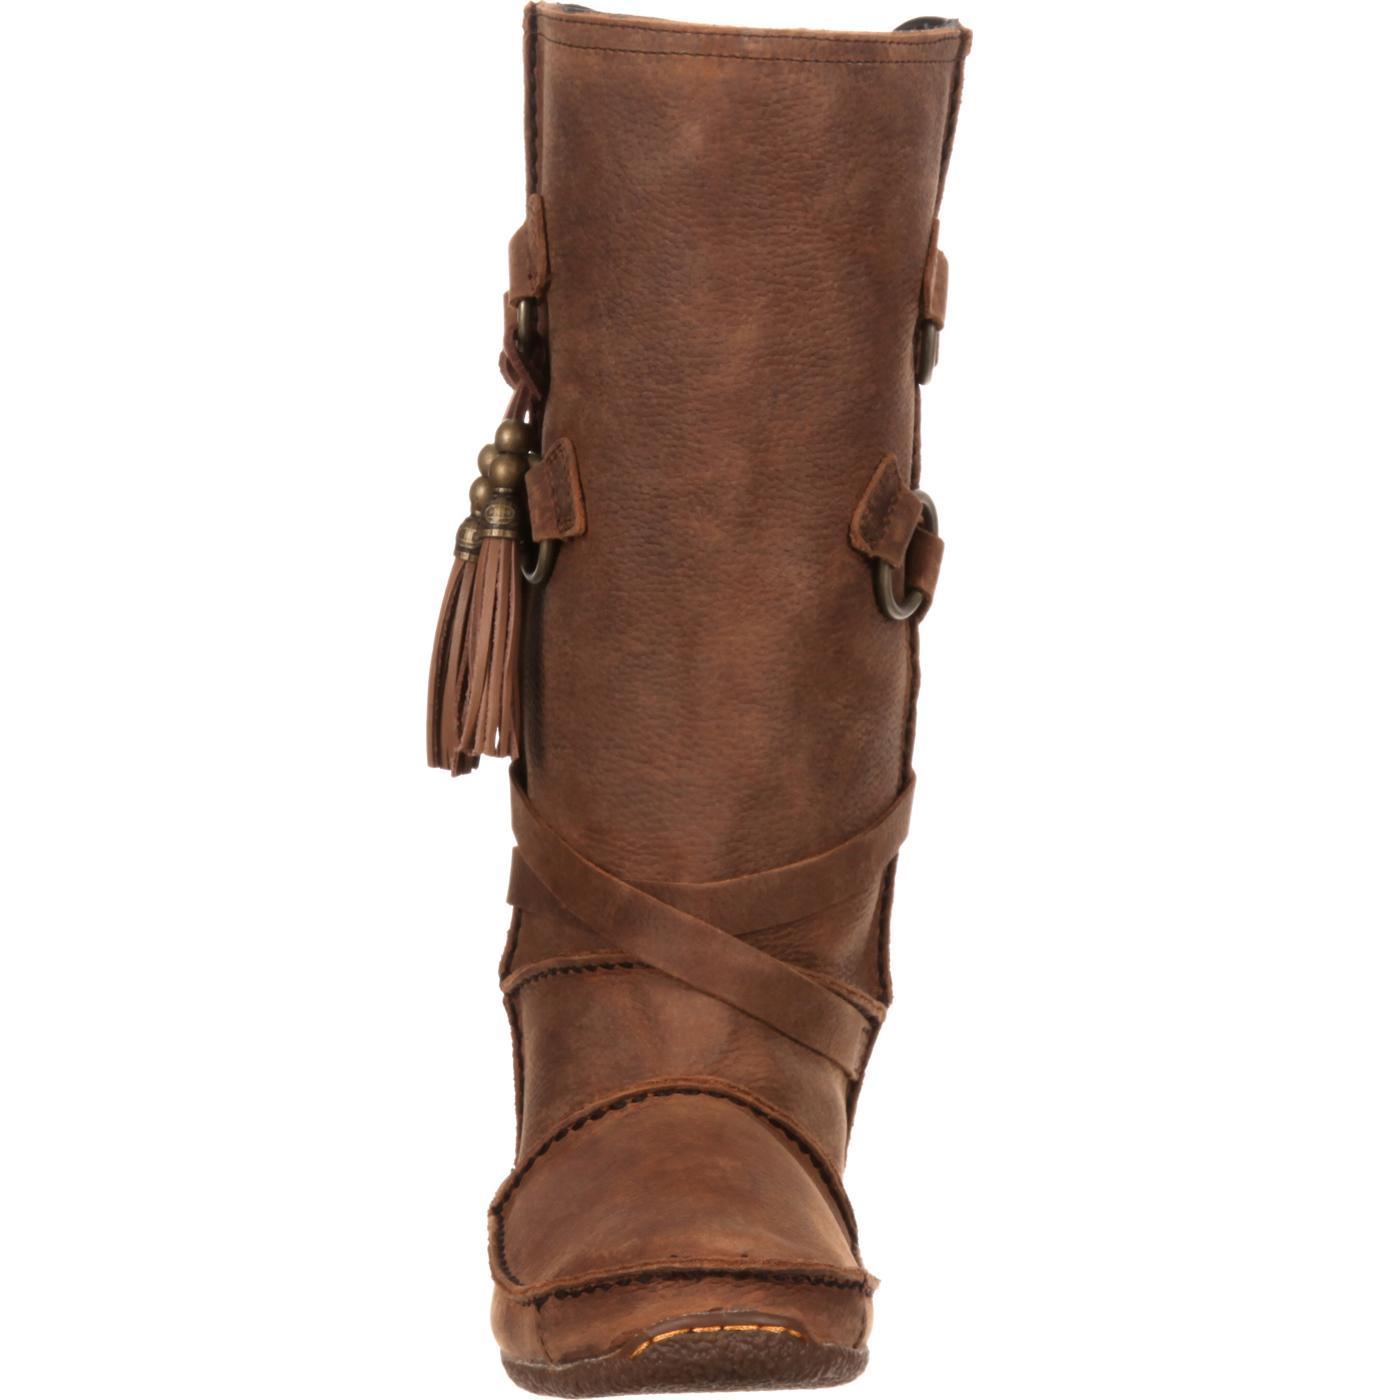 moccasin boots images efgfjfi